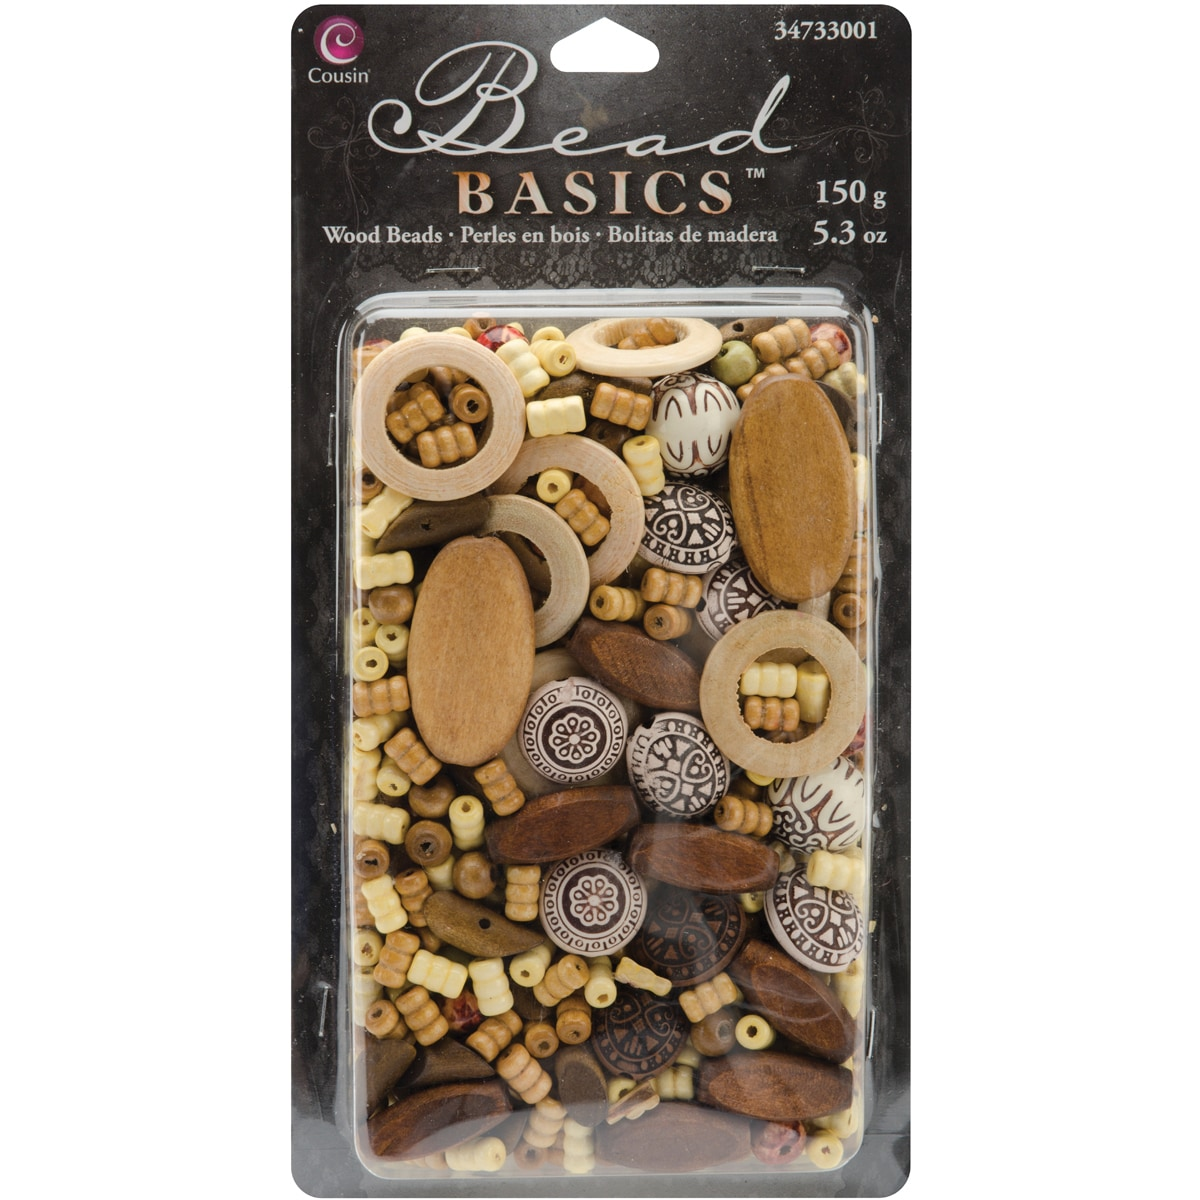 Cousin Corporation of America Jewelry Basics Wood Mix 1 (...